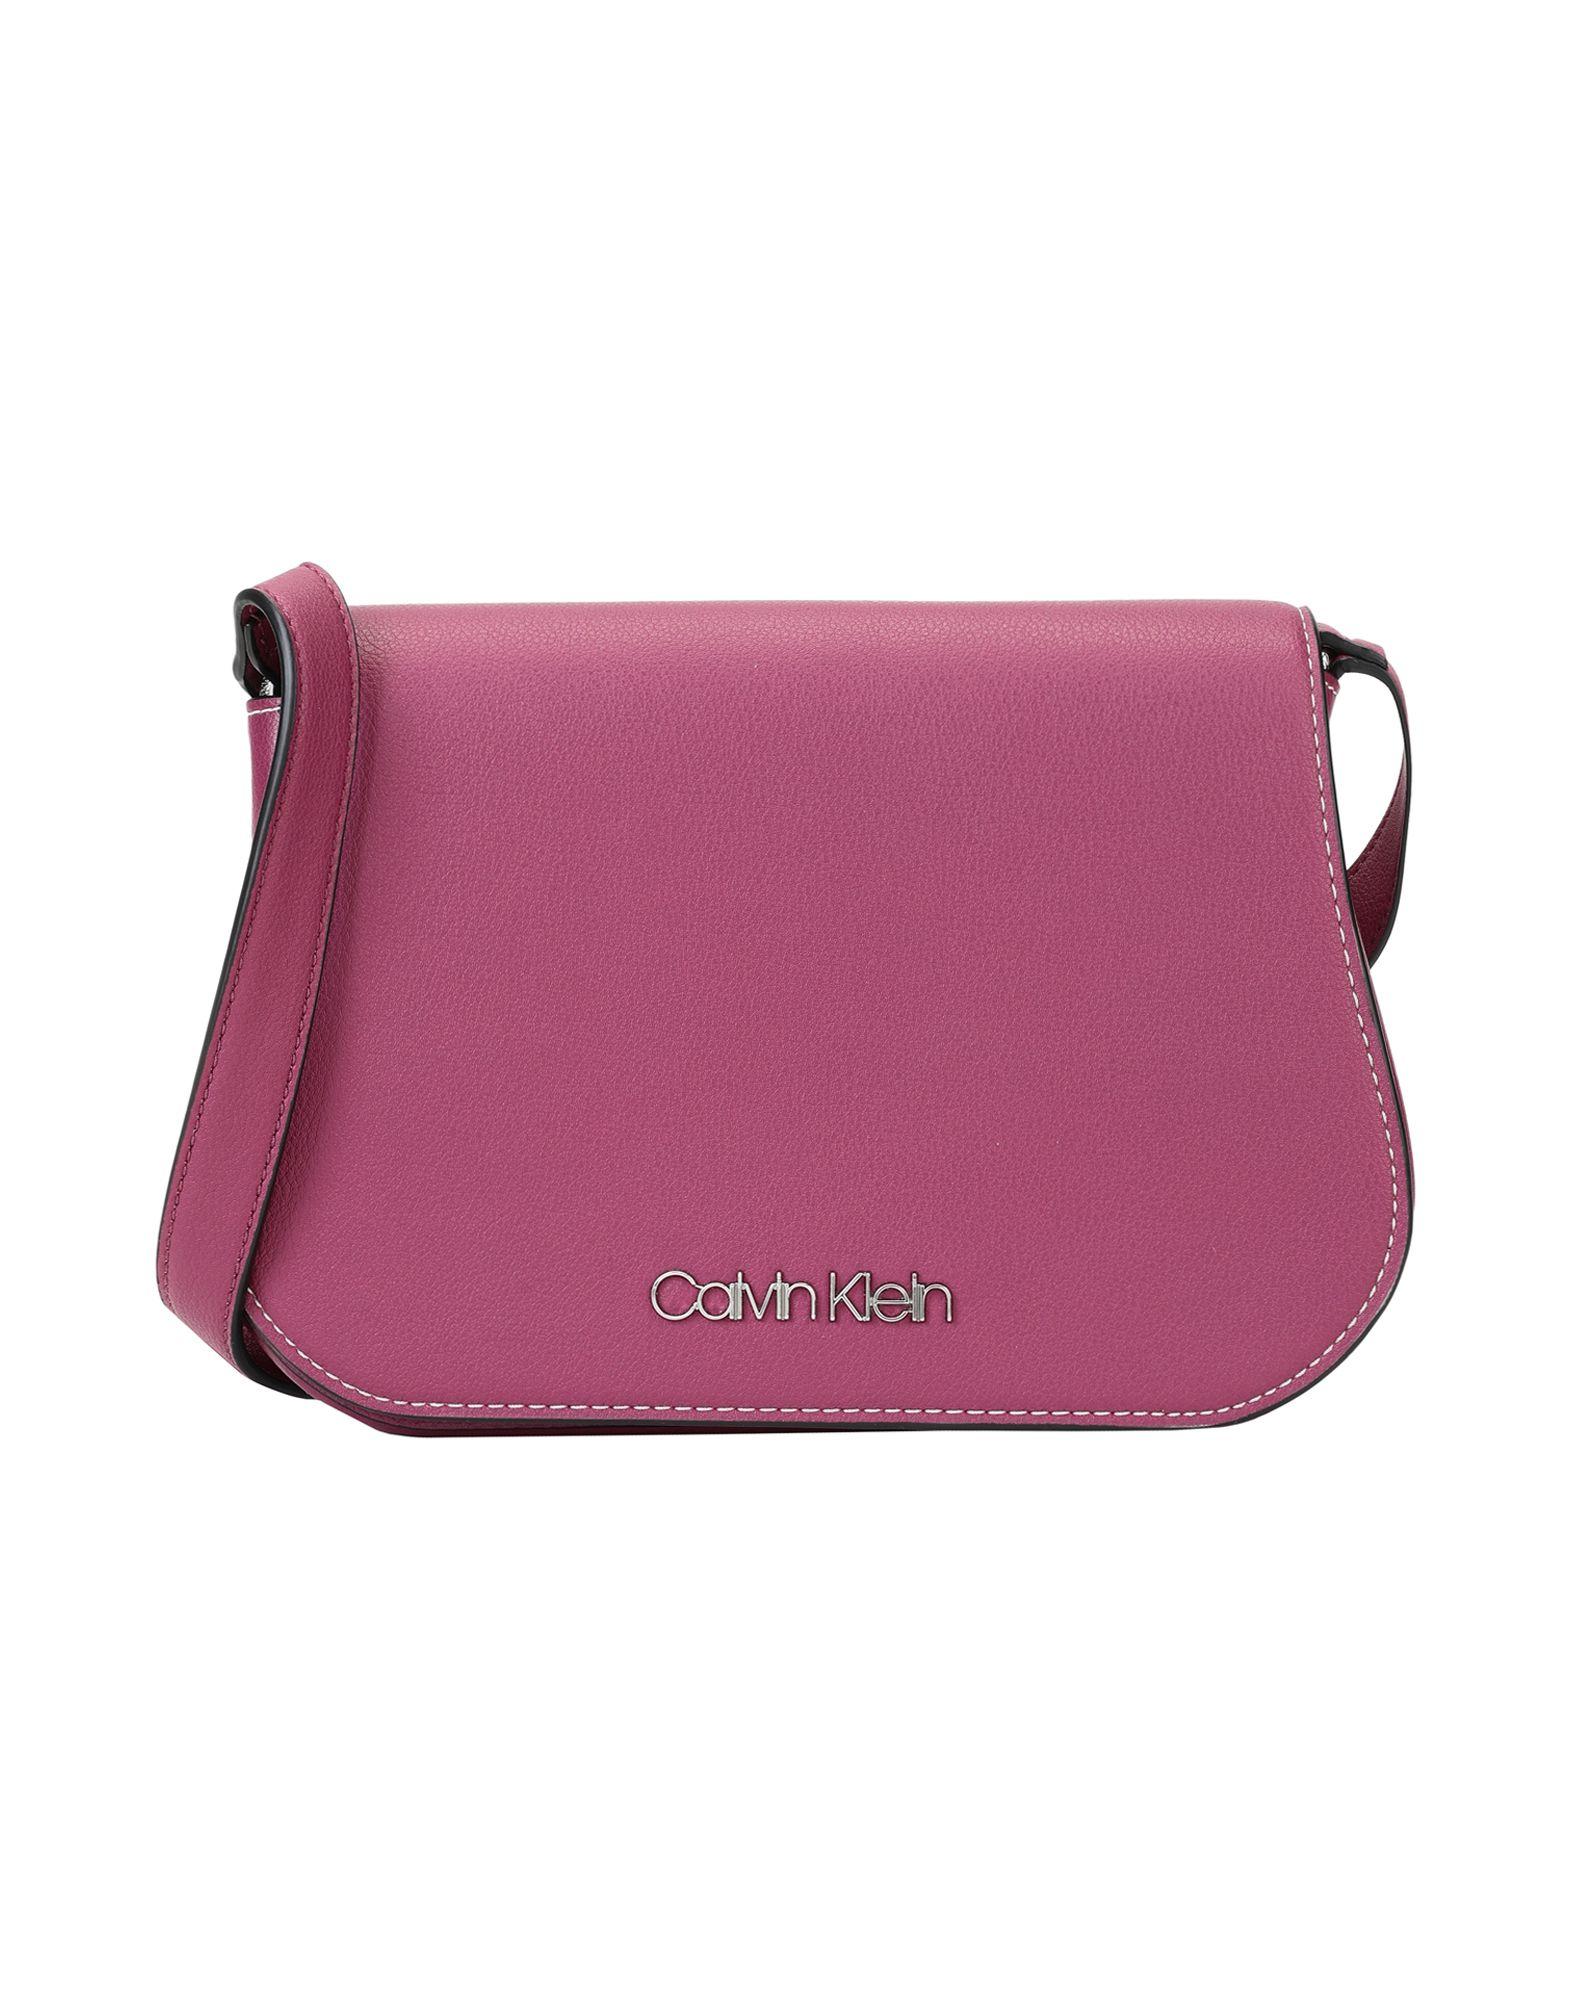 b6a4f43223 Τσάντα Ταχυδρόμου Calvin Klein Γυναίκα - Τσάντες Ταχυδρόμου Calvin Klein  στο YOOX - 45451946IE